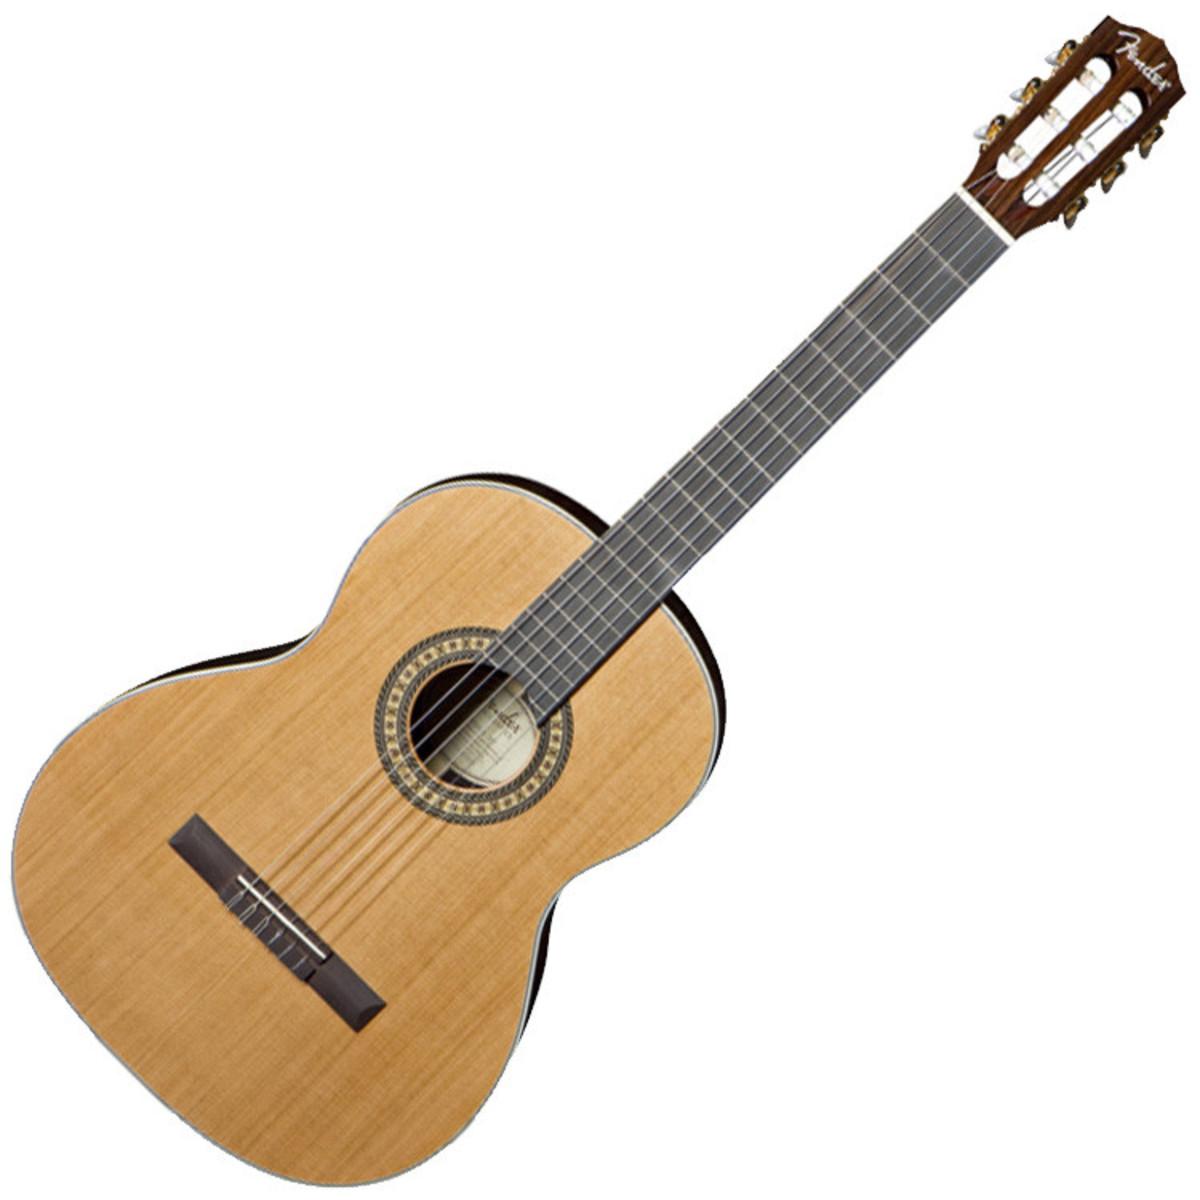 fender cn 320 as tous guitare classique massif naturel. Black Bedroom Furniture Sets. Home Design Ideas